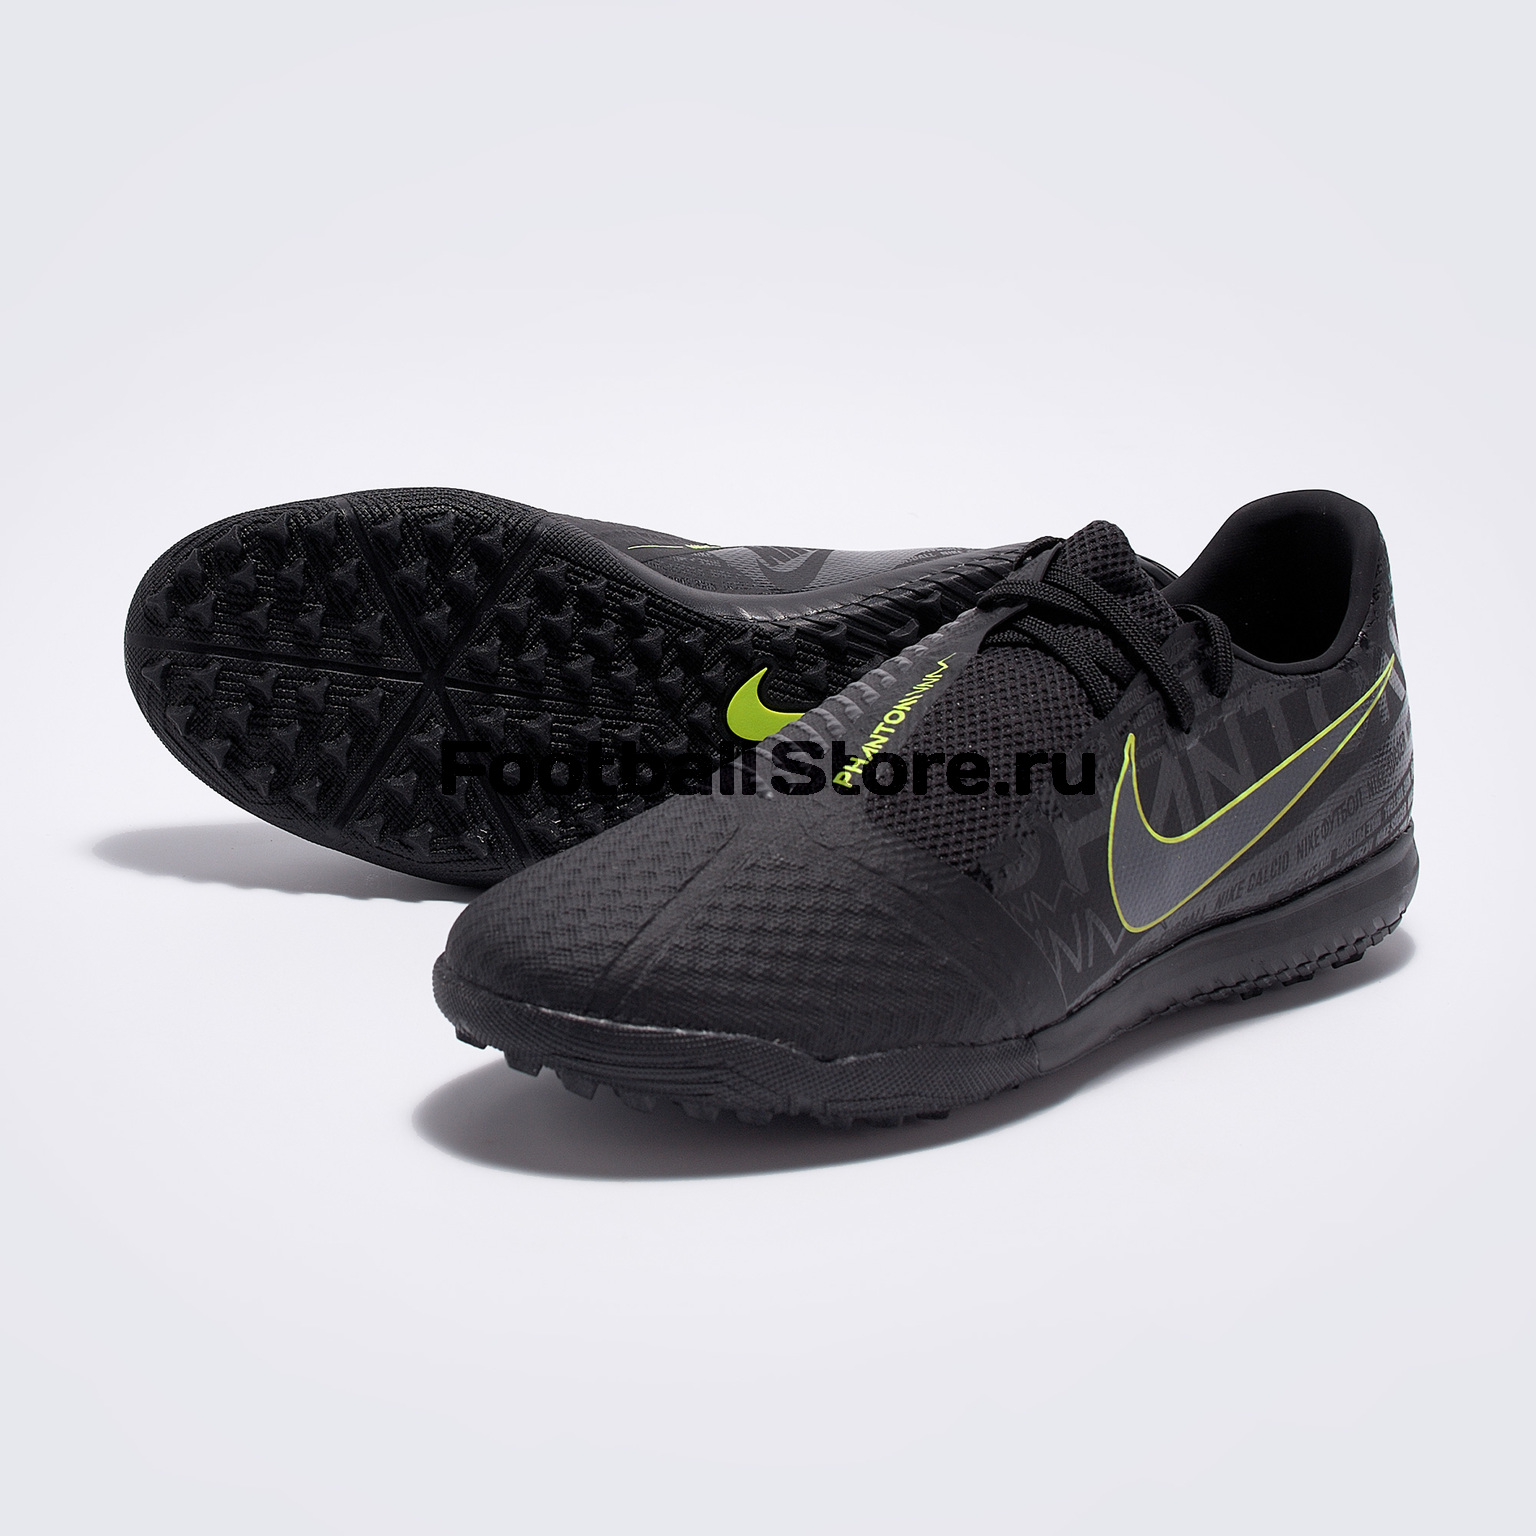 Шиповки Nike Phantom Venom Academy TF AO0571-007 цена в Москве и Питере